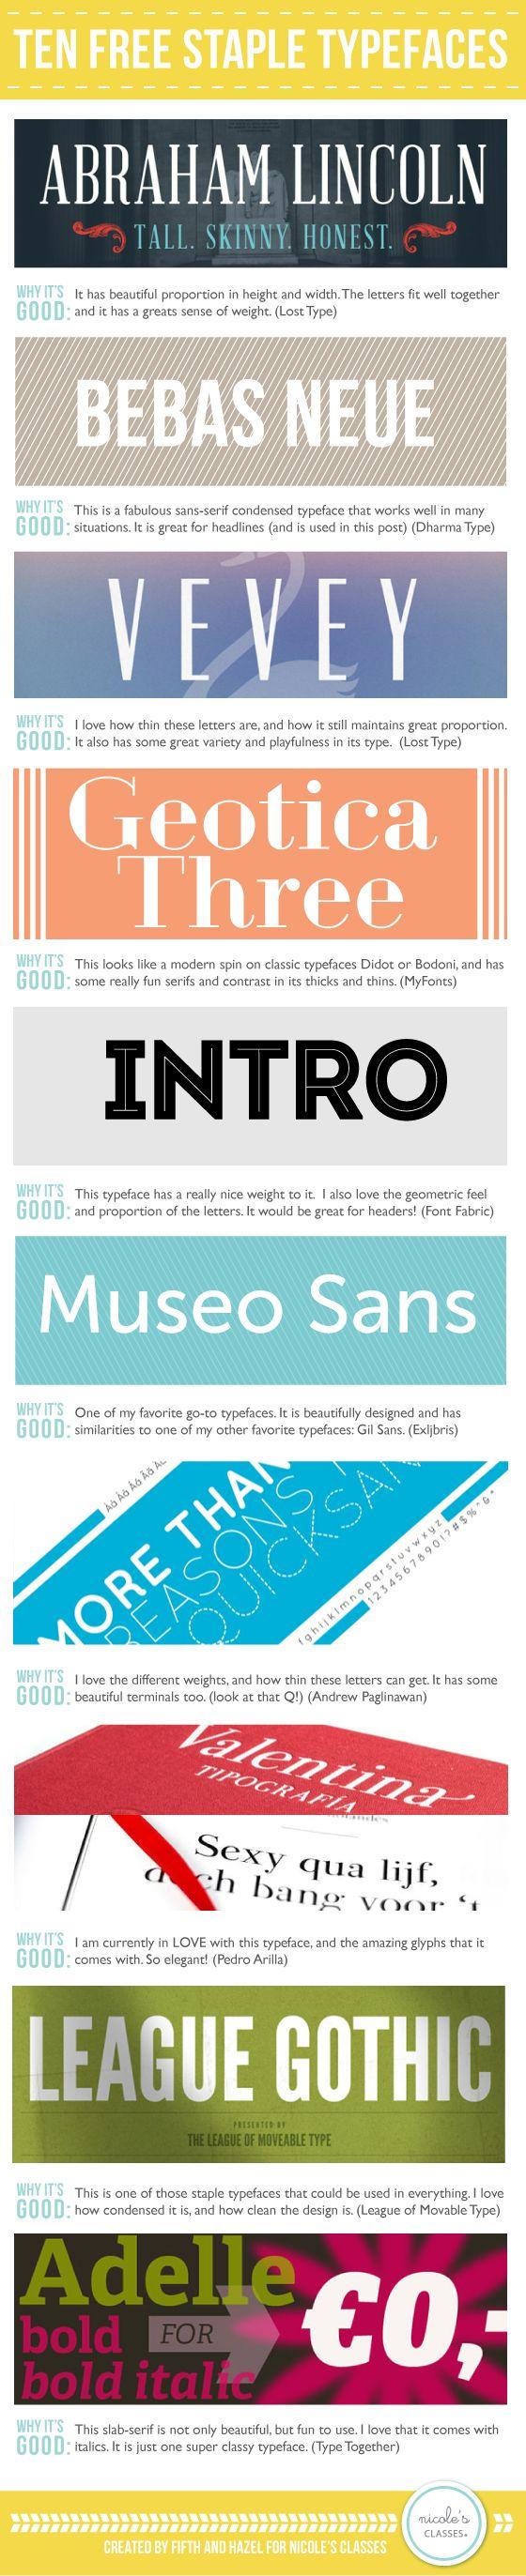 10 Free Staple Typefaces (Fonts) | | Nicoles Classes